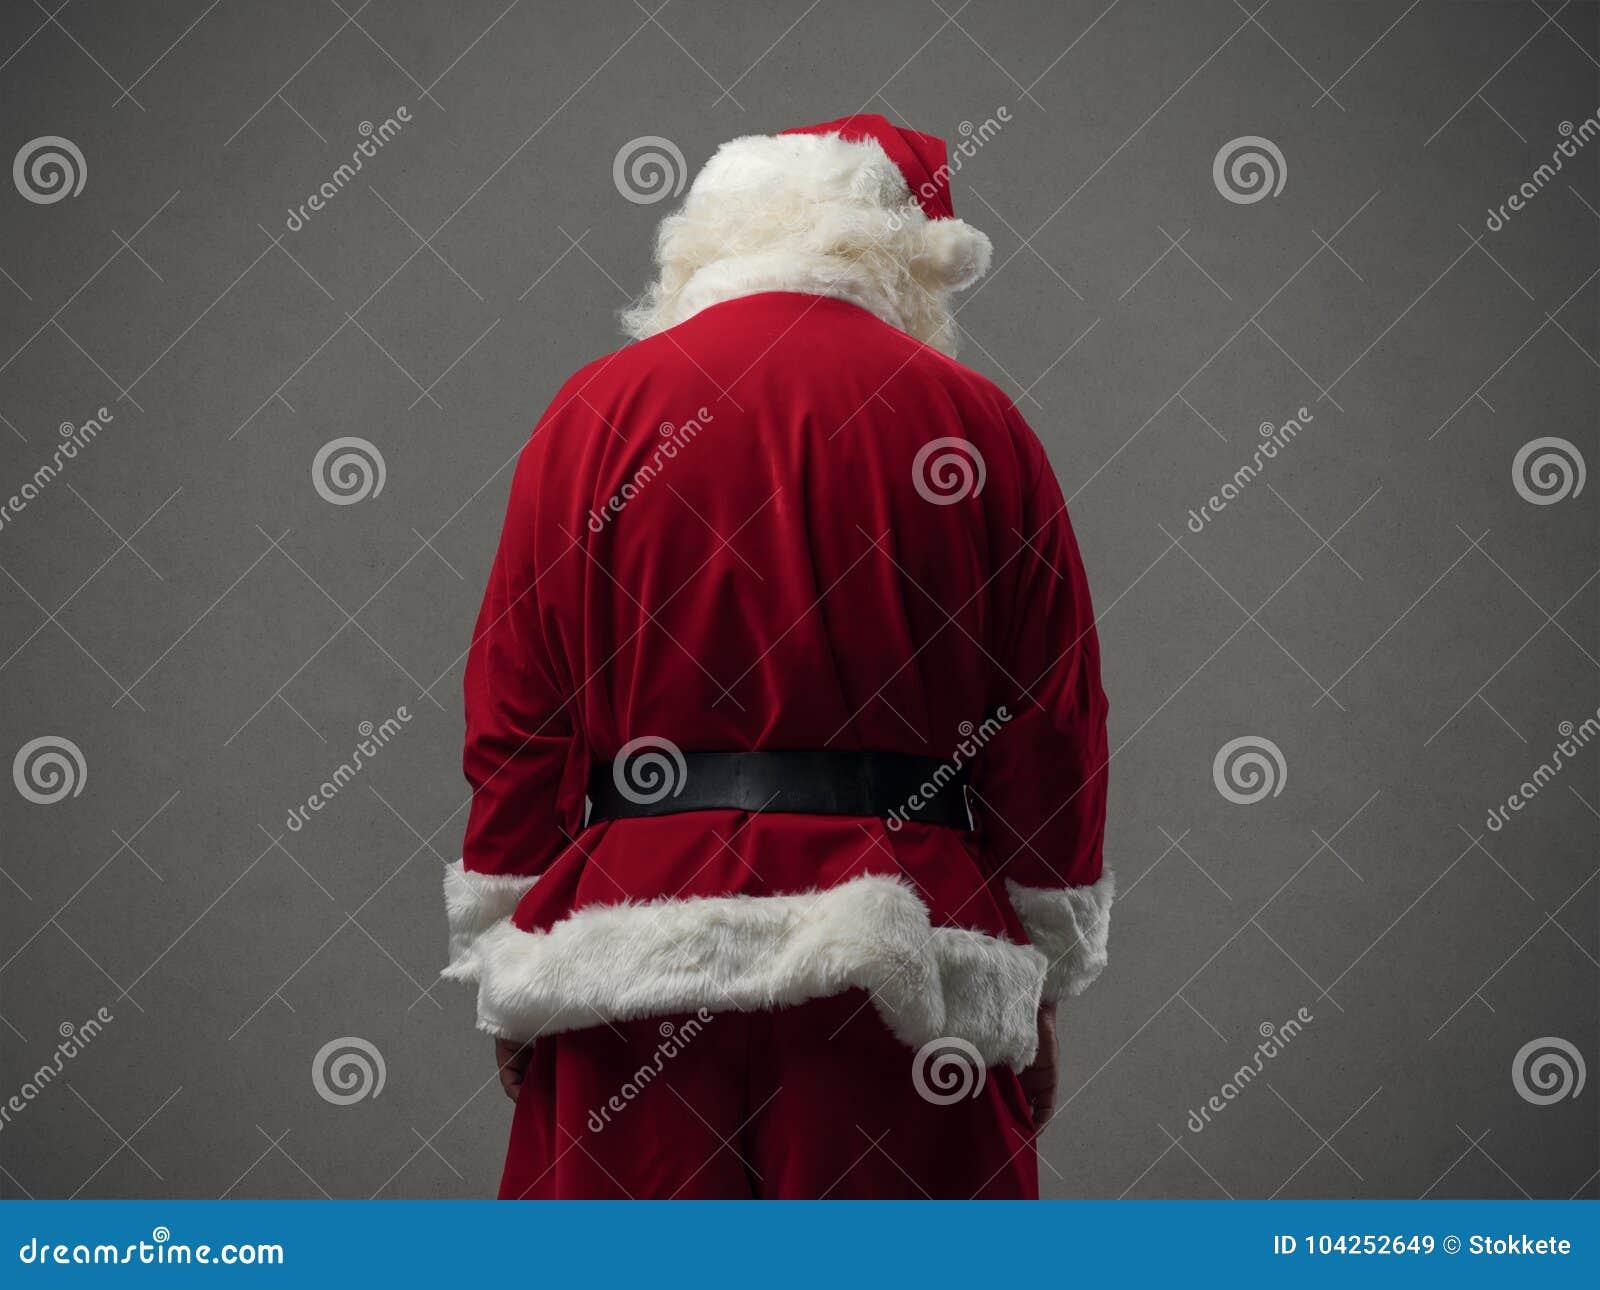 Santa Claus baksidasikt